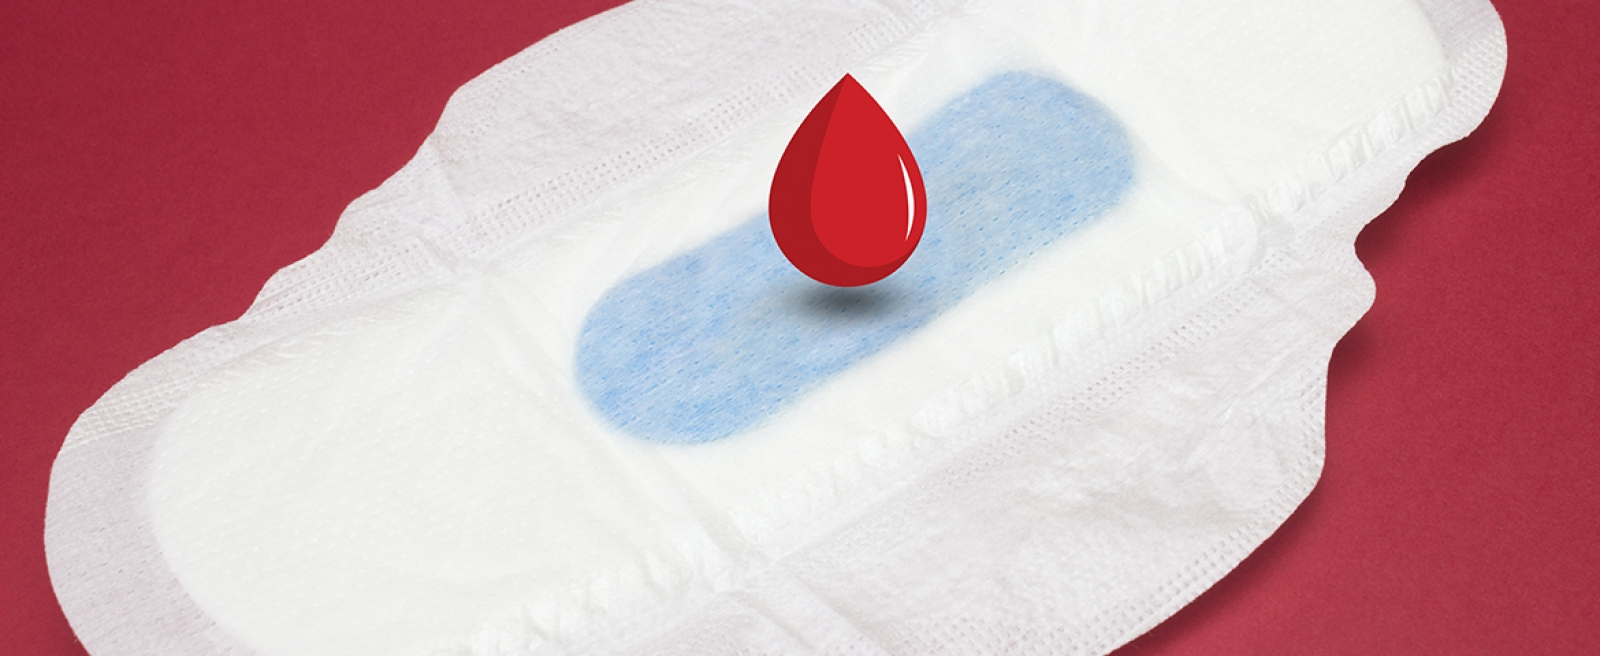 sangramento na menopausa